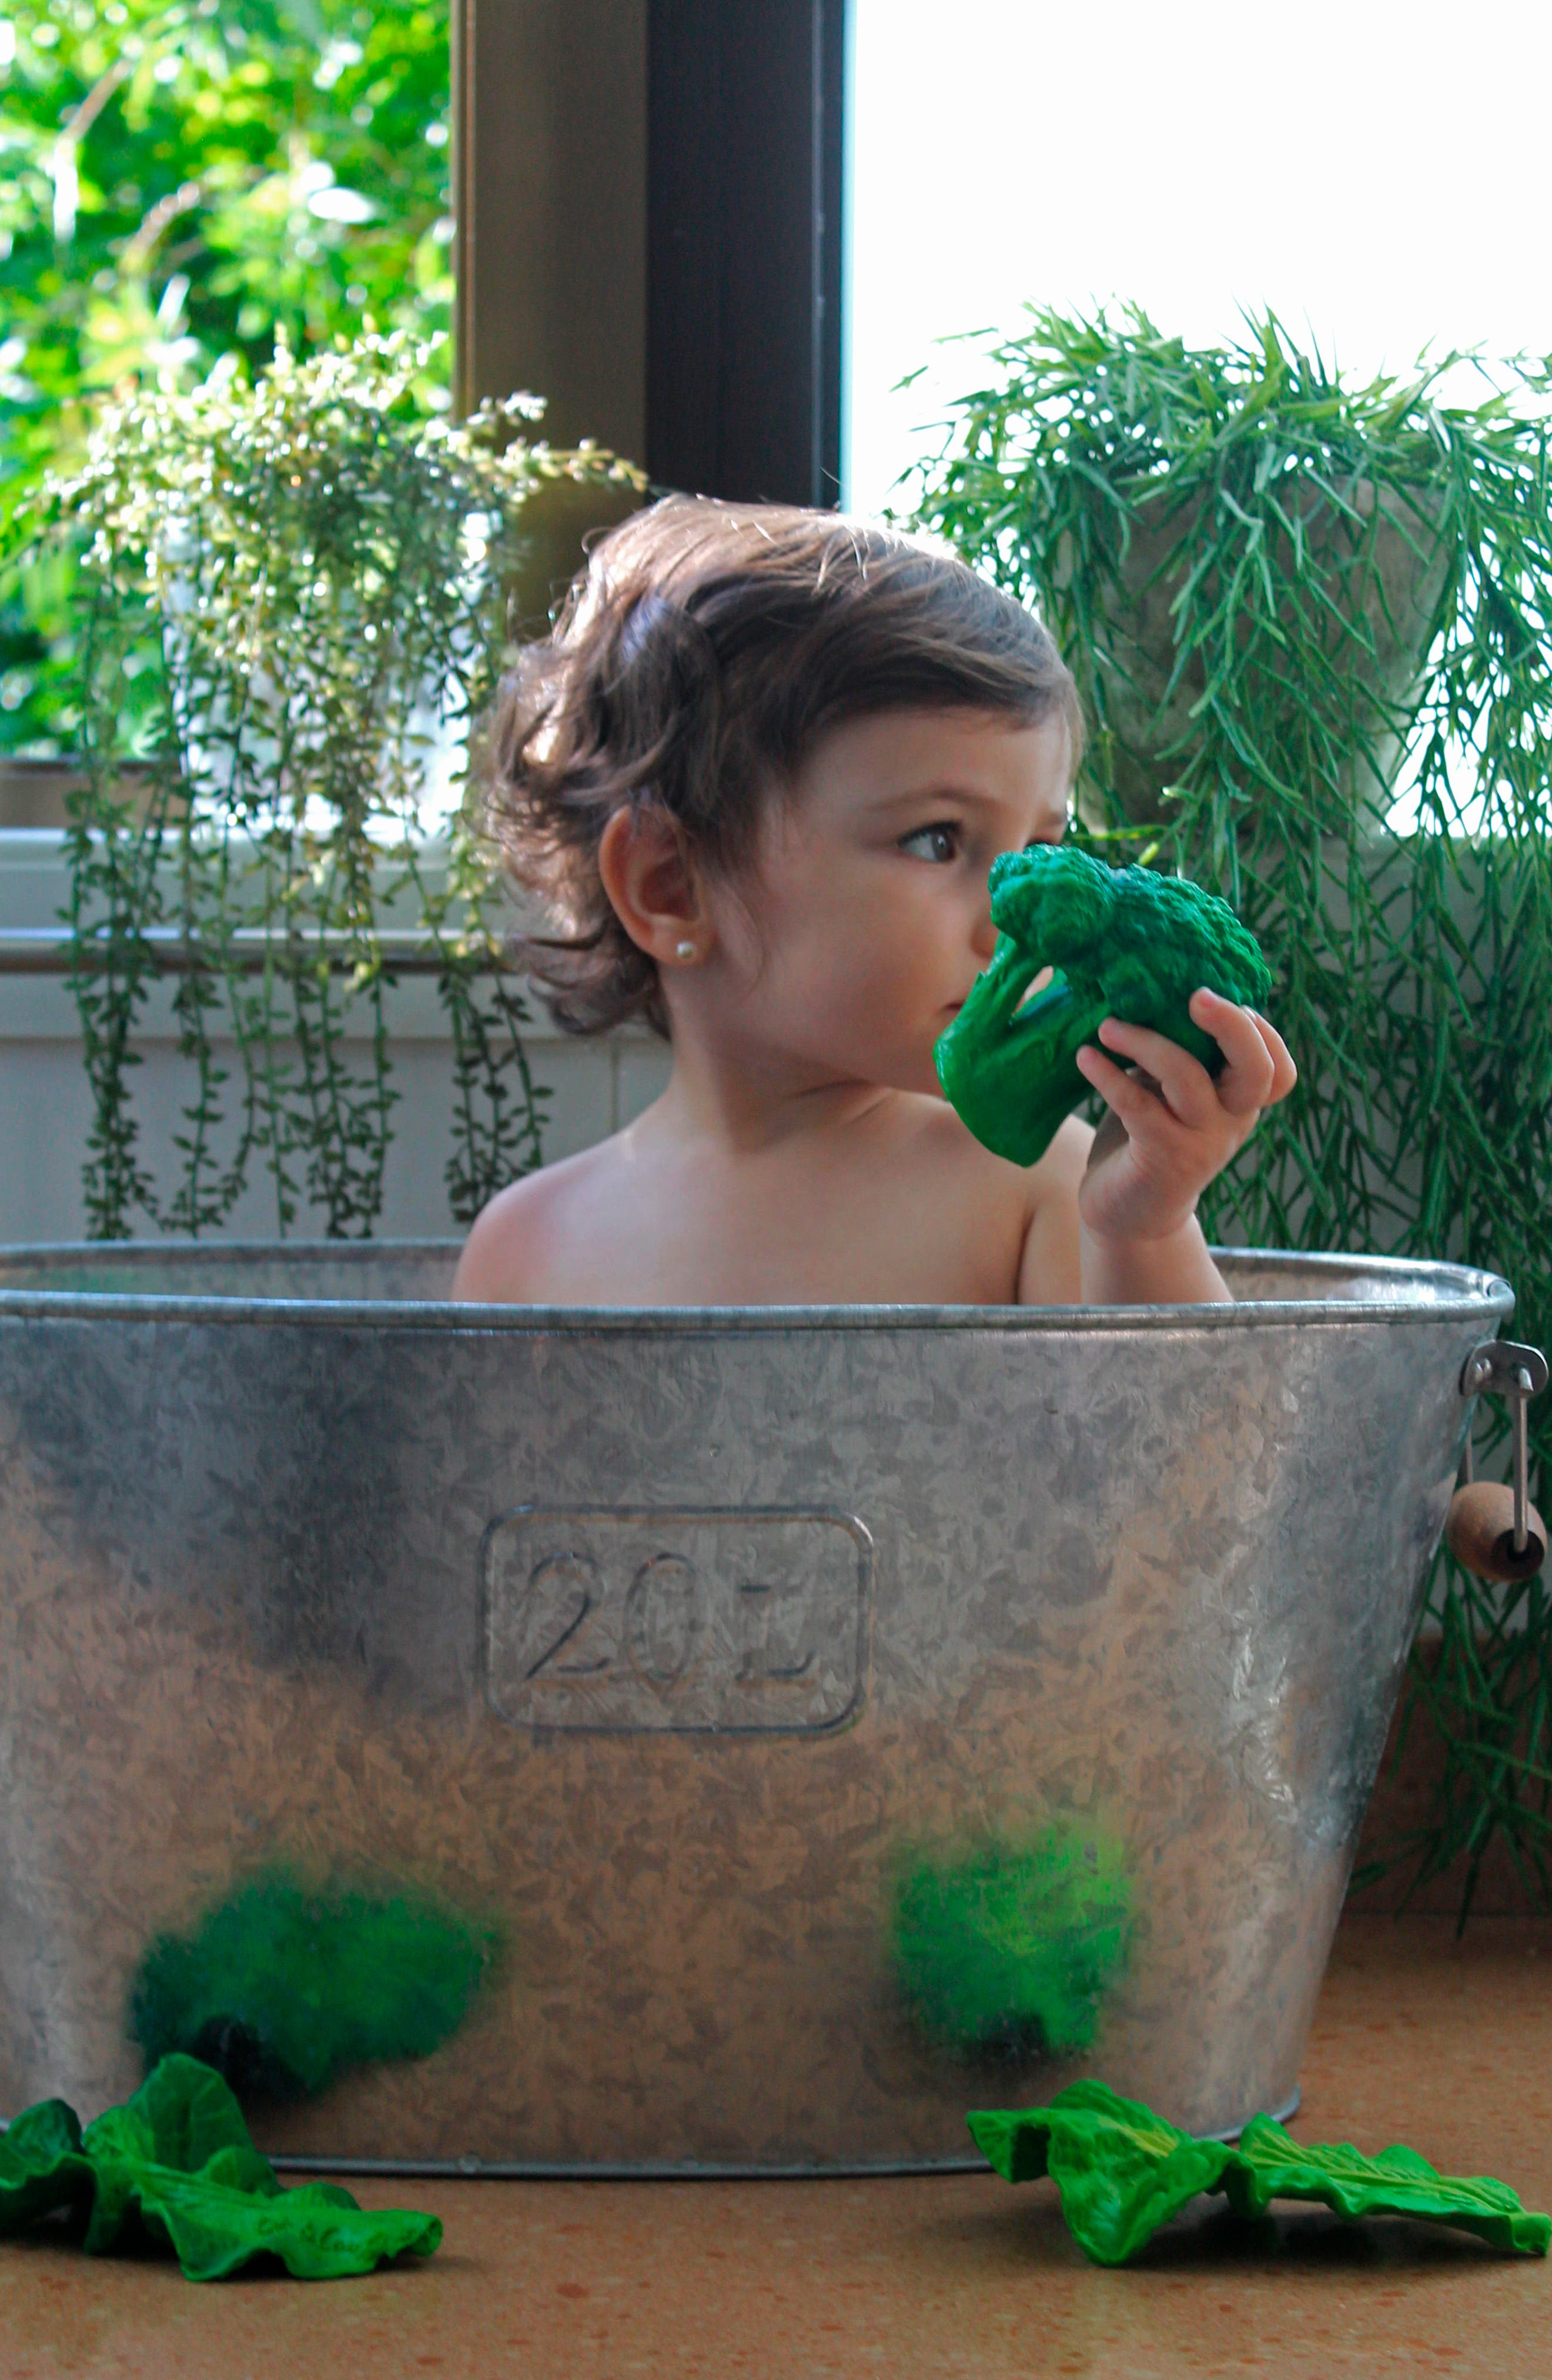 OLI & CAROL, Oli and Carol Brucy the Broccoli Teething Toy, Alternate thumbnail 7, color, GREEN